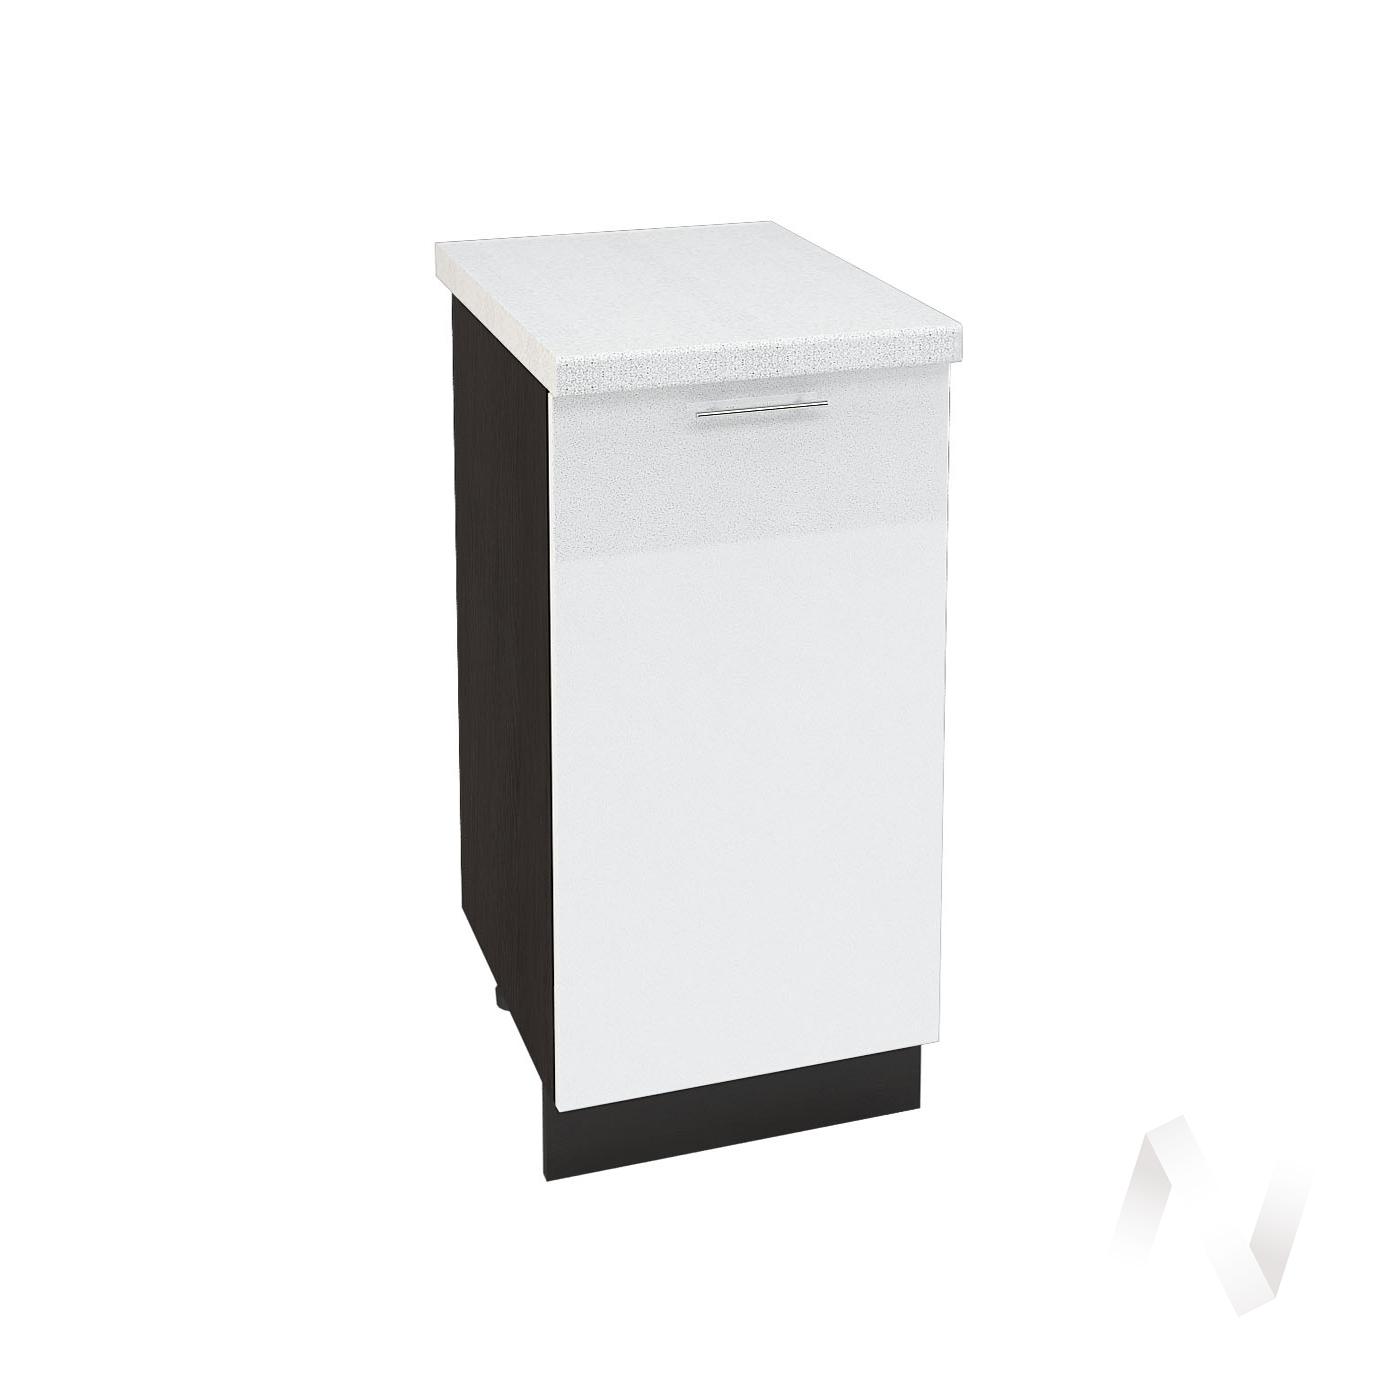 "Кухня ""Валерия-М"": Шкаф нижний 400, ШН 400 (белый глянец/корпус венге)"